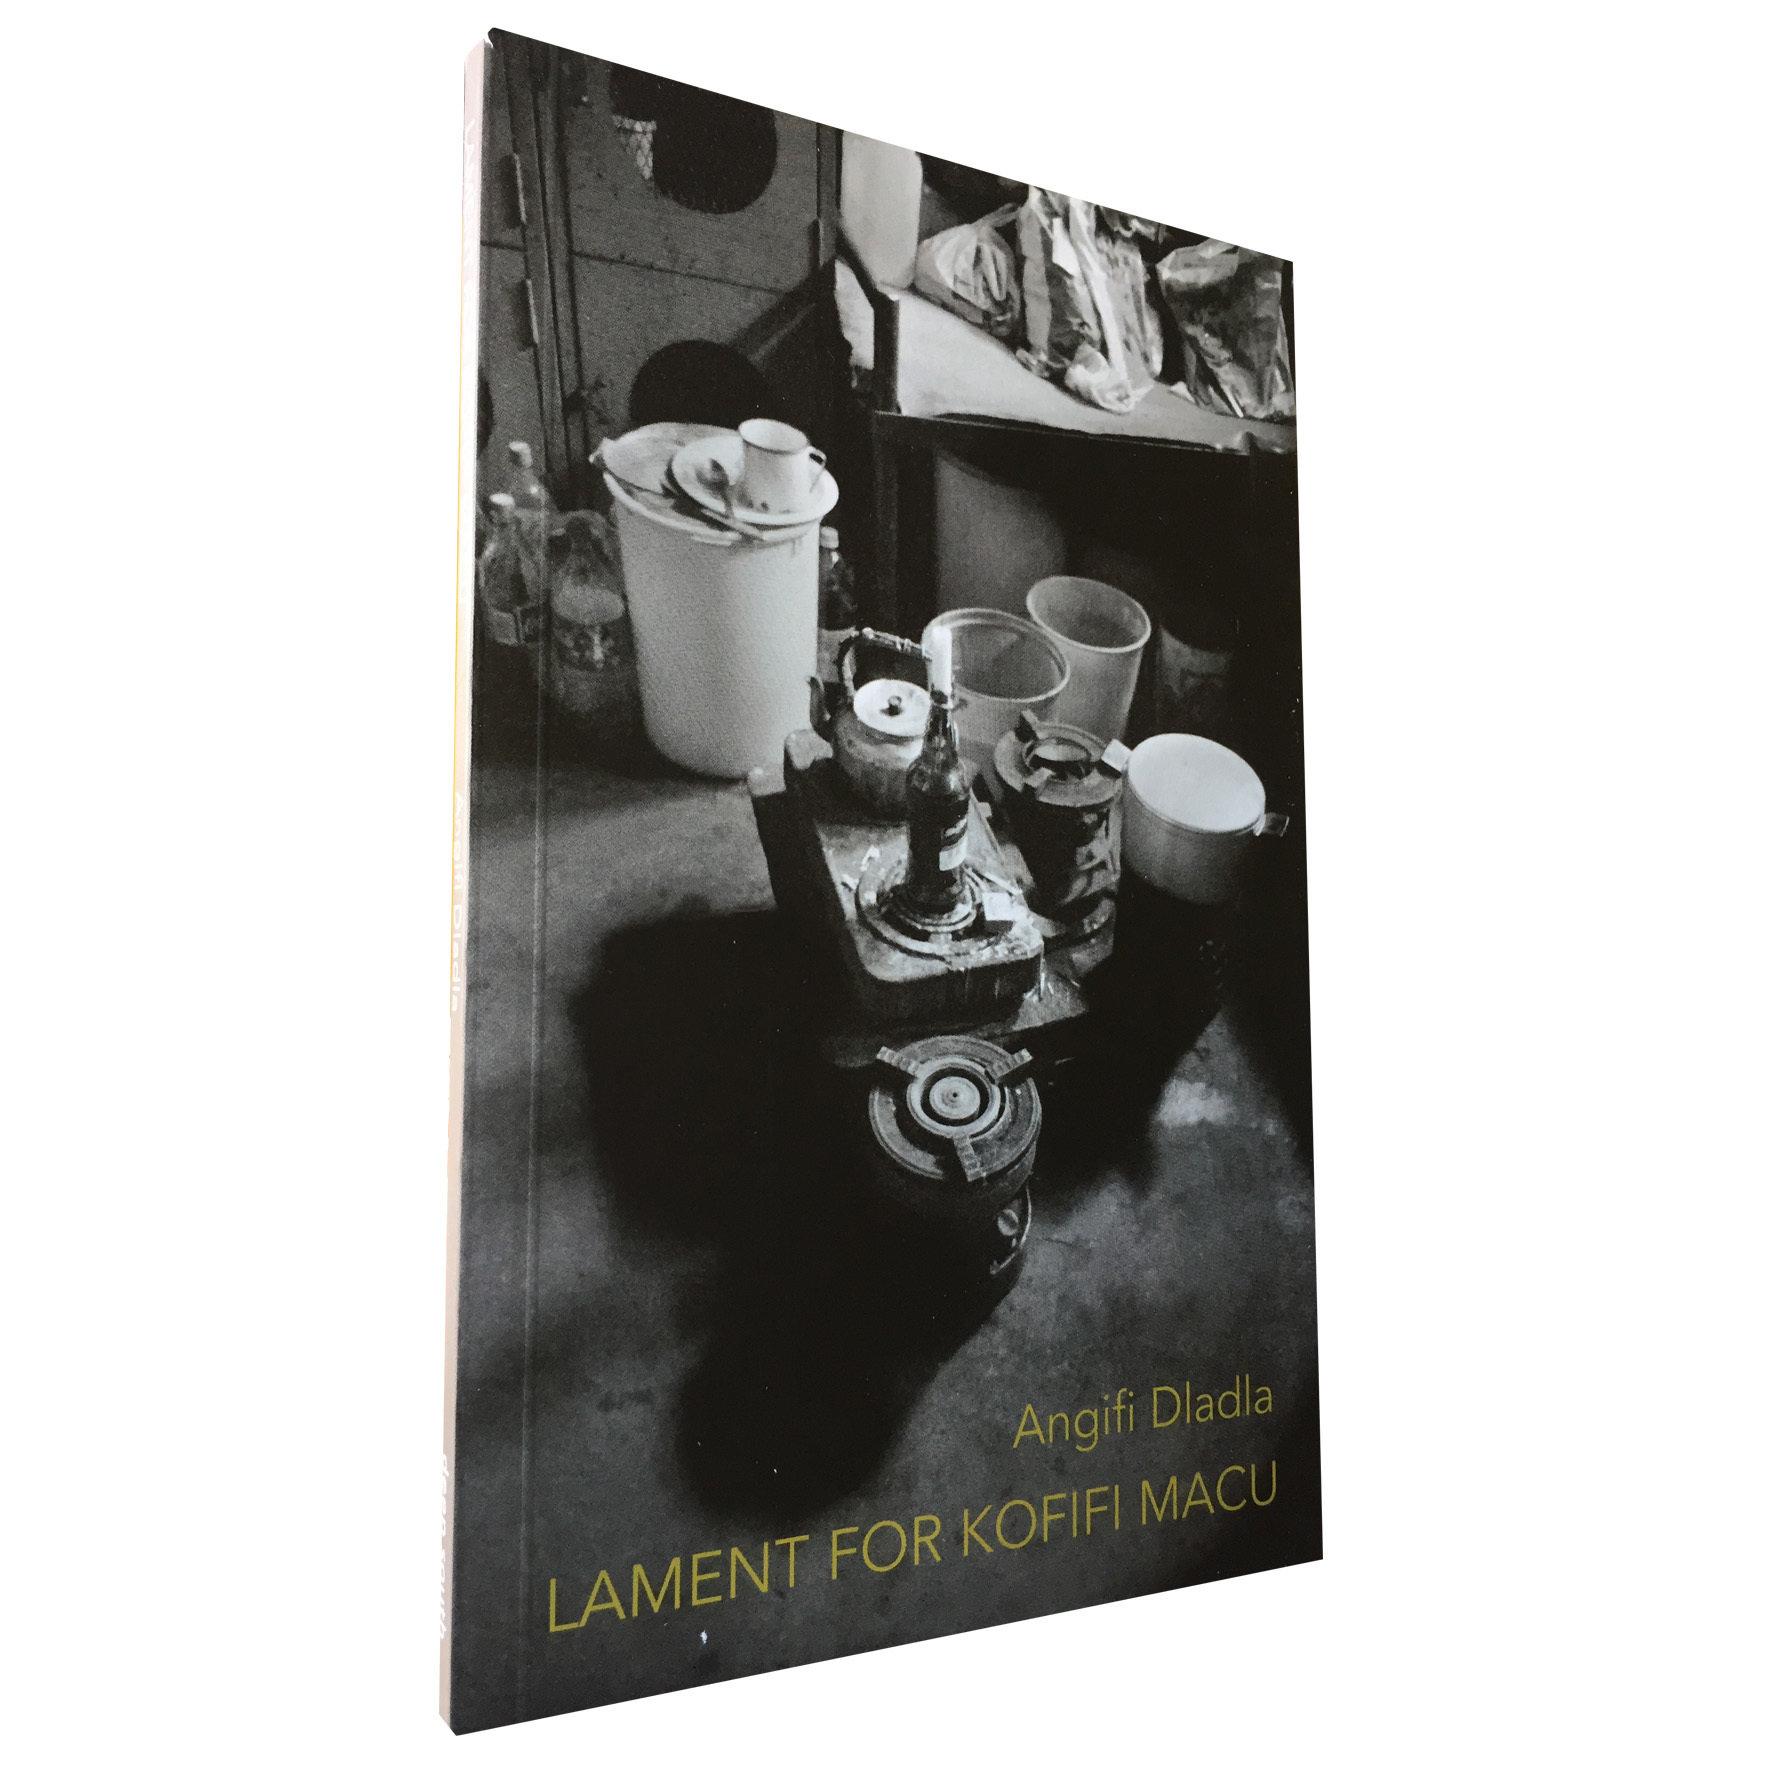 Lament for Kofifi Macu by Angifi Dladla (Deep South Books) DS11